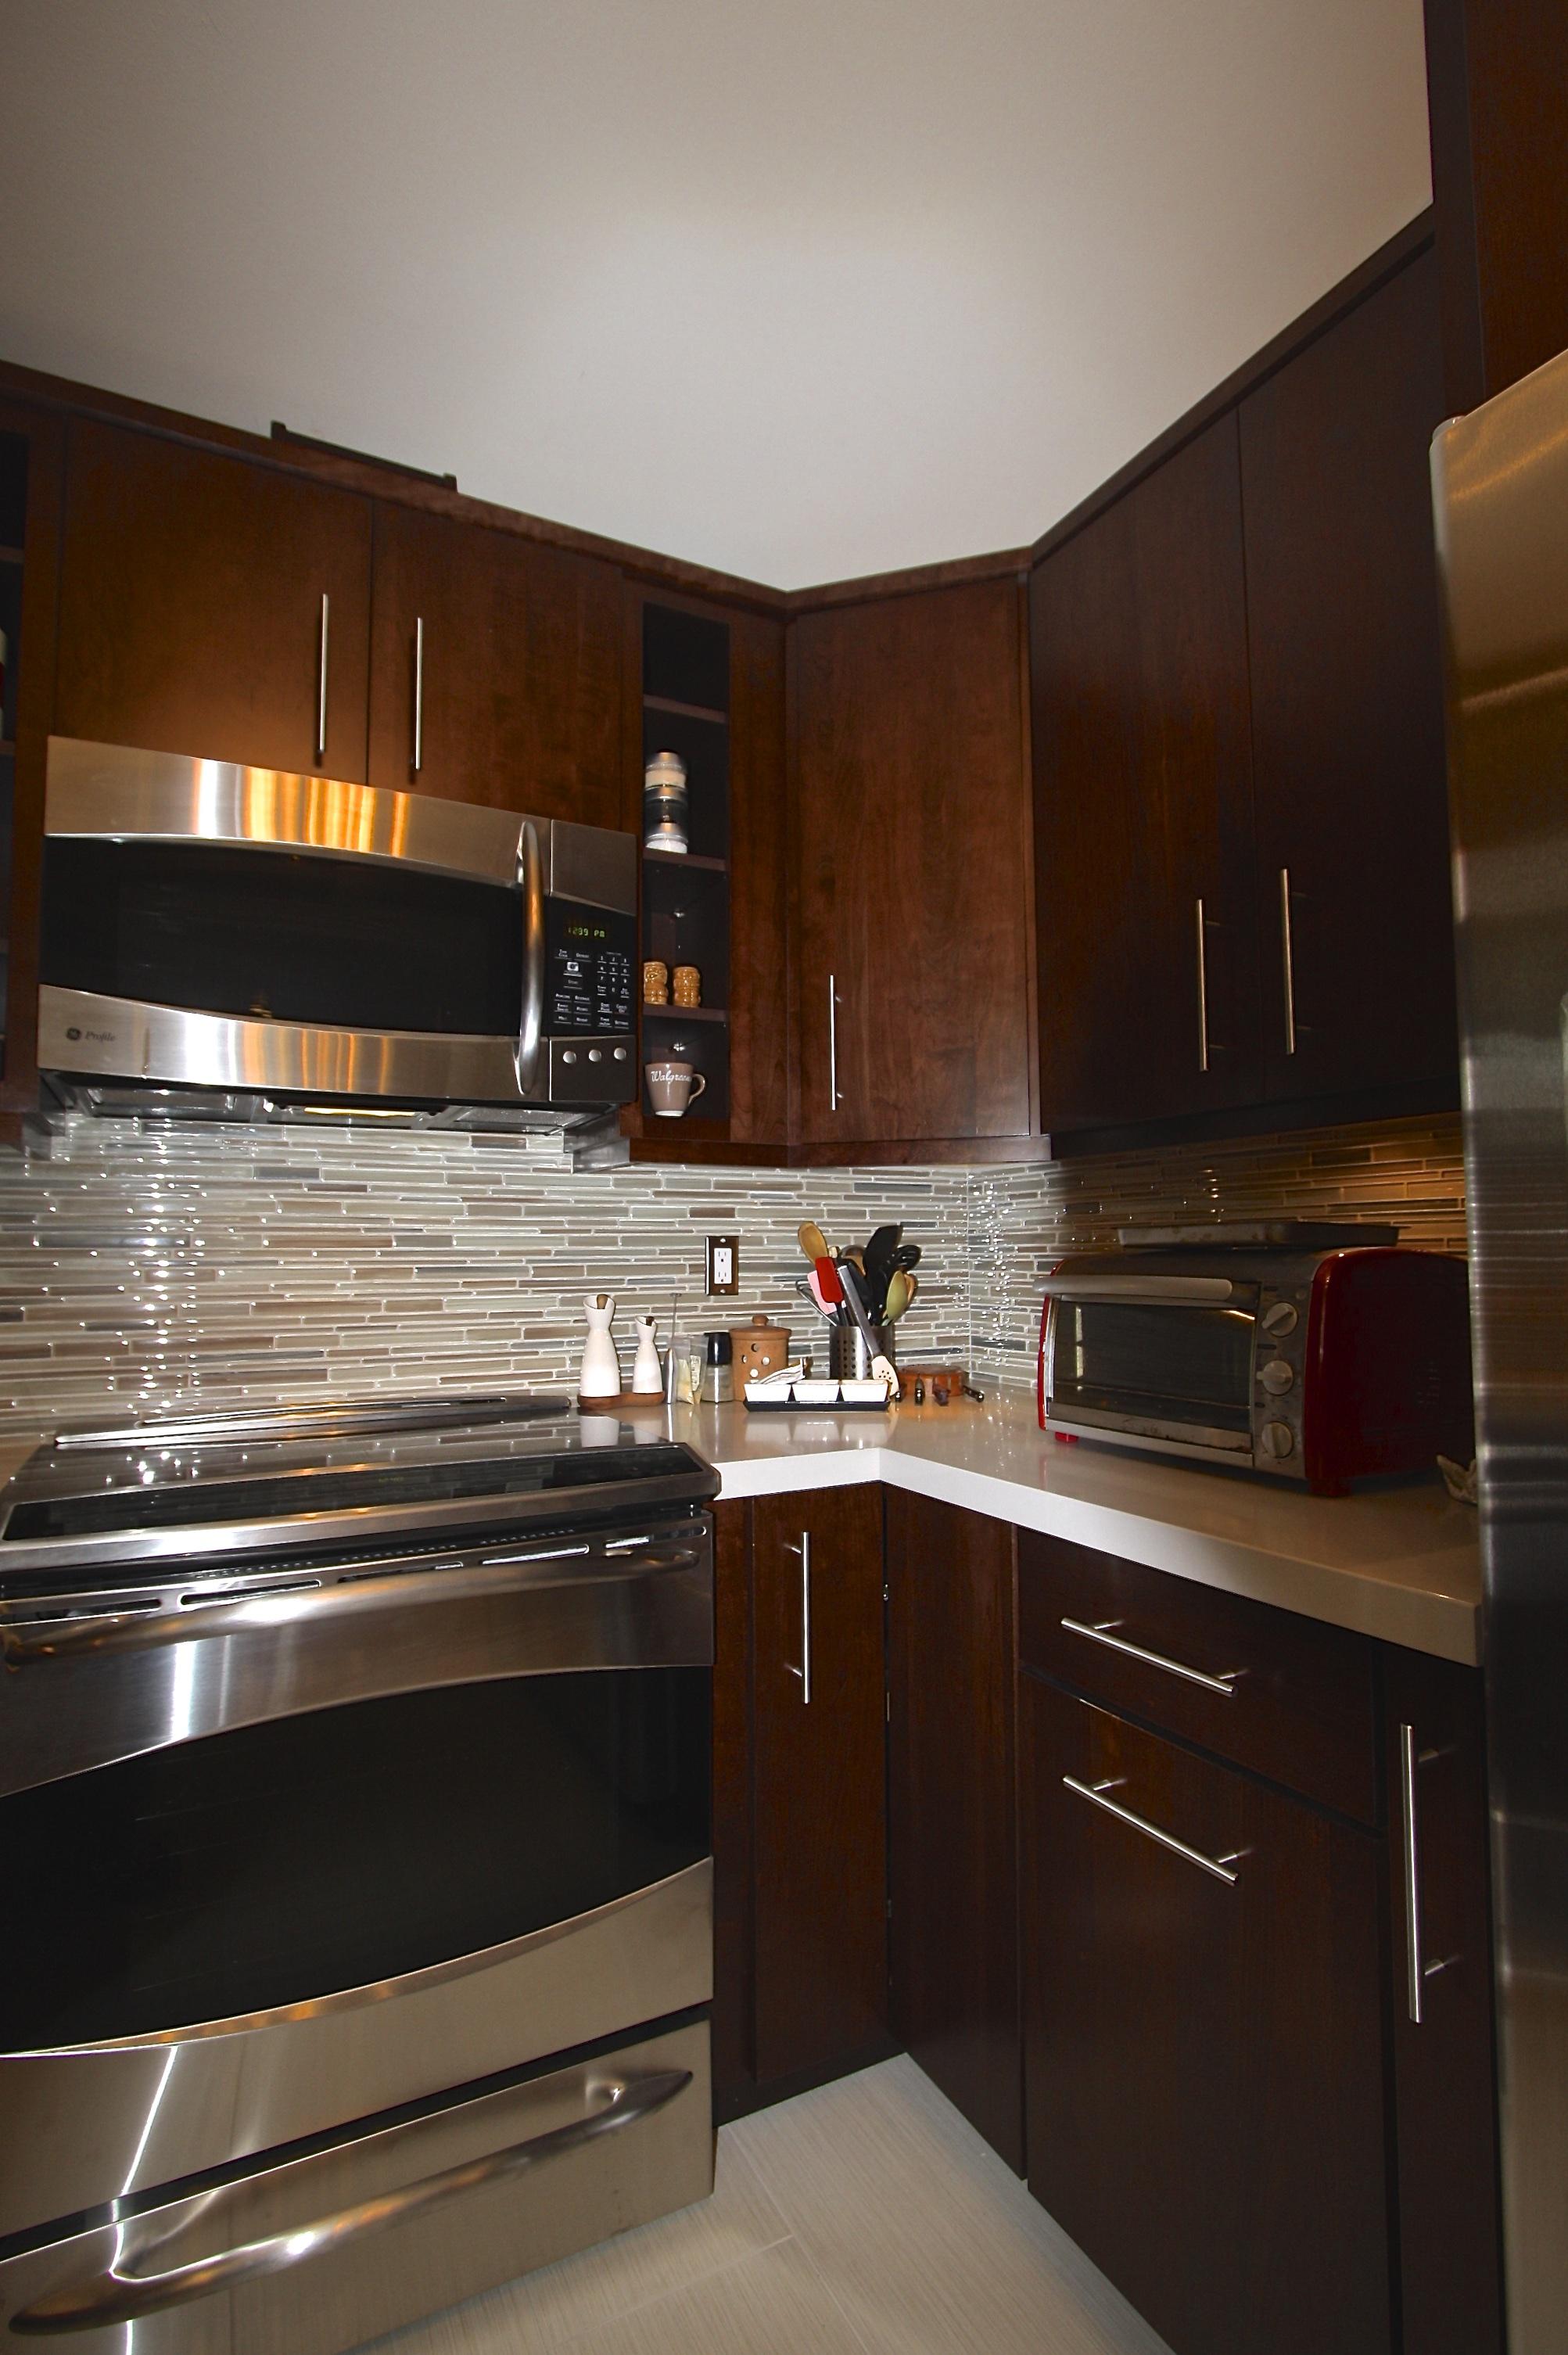 EAB Contemporary Kitchen Remodel 6.jpg